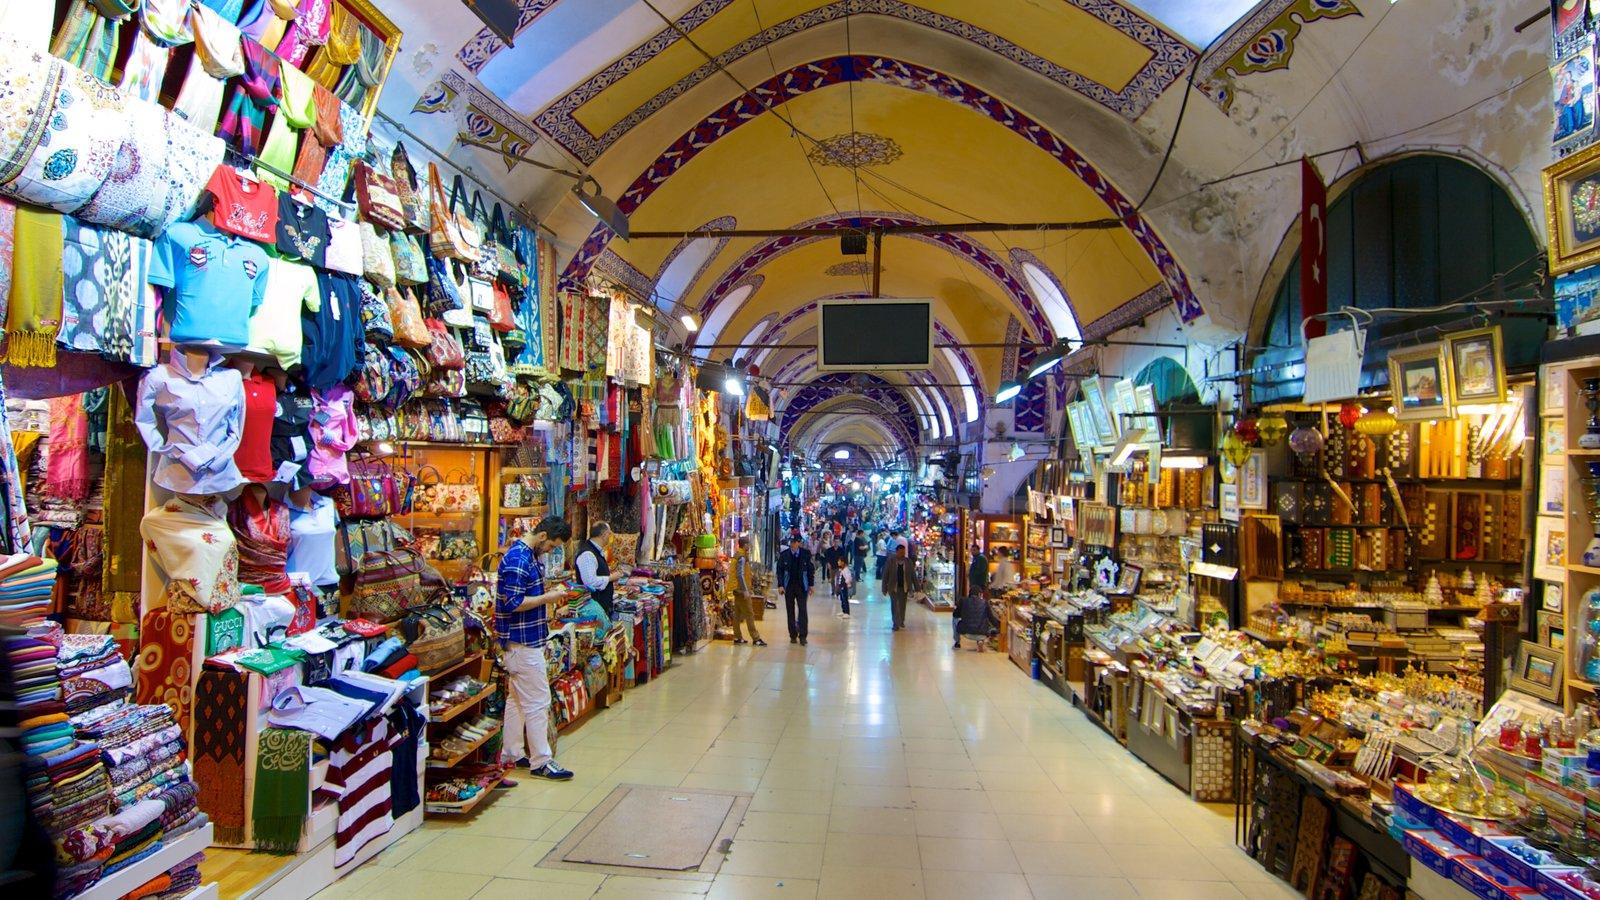 Grand Bazaar featuring shopping, markets and interior views